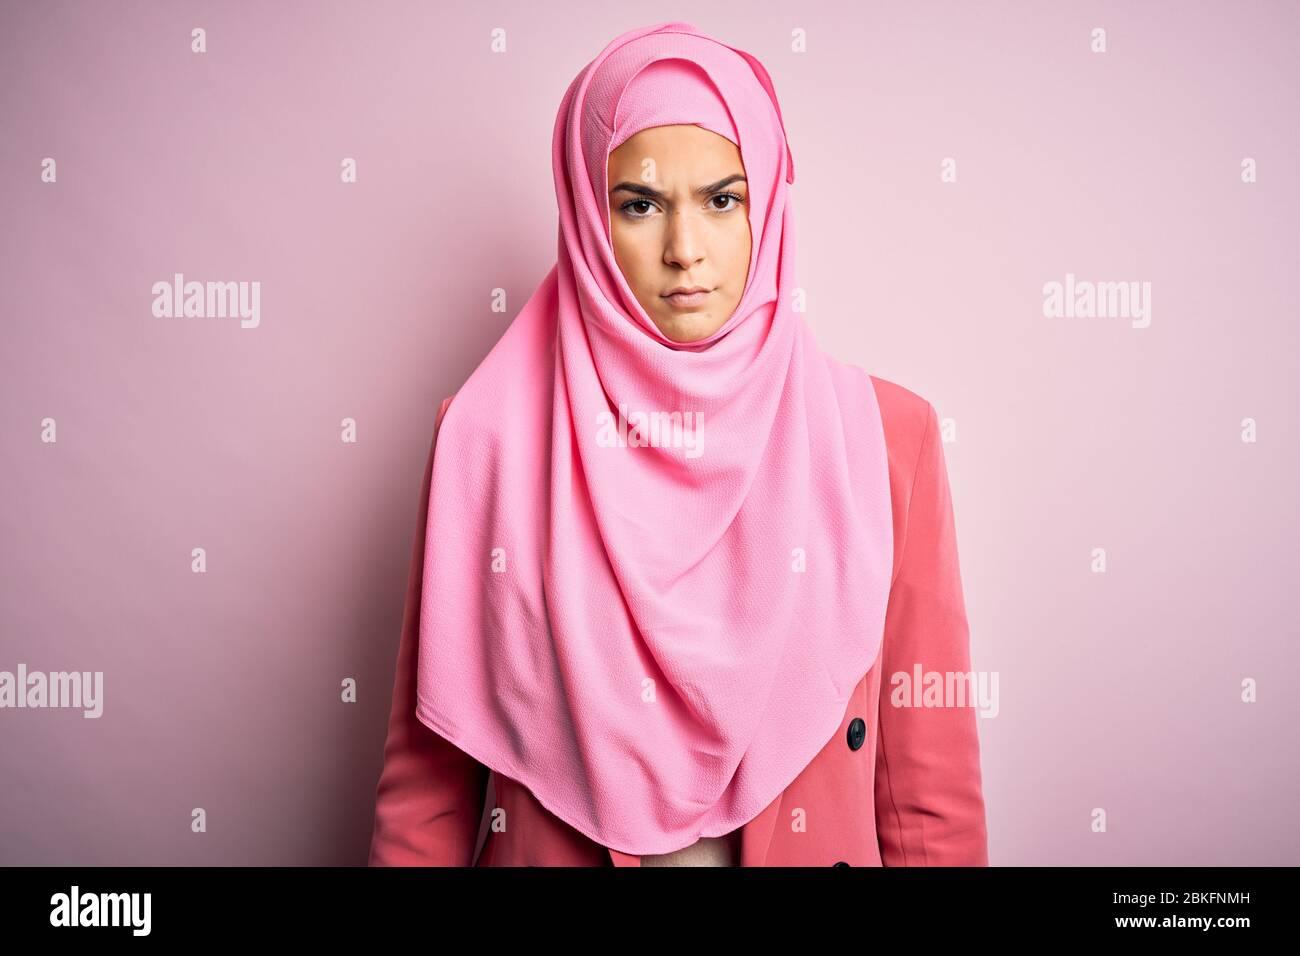 Simple image muslim girl How to